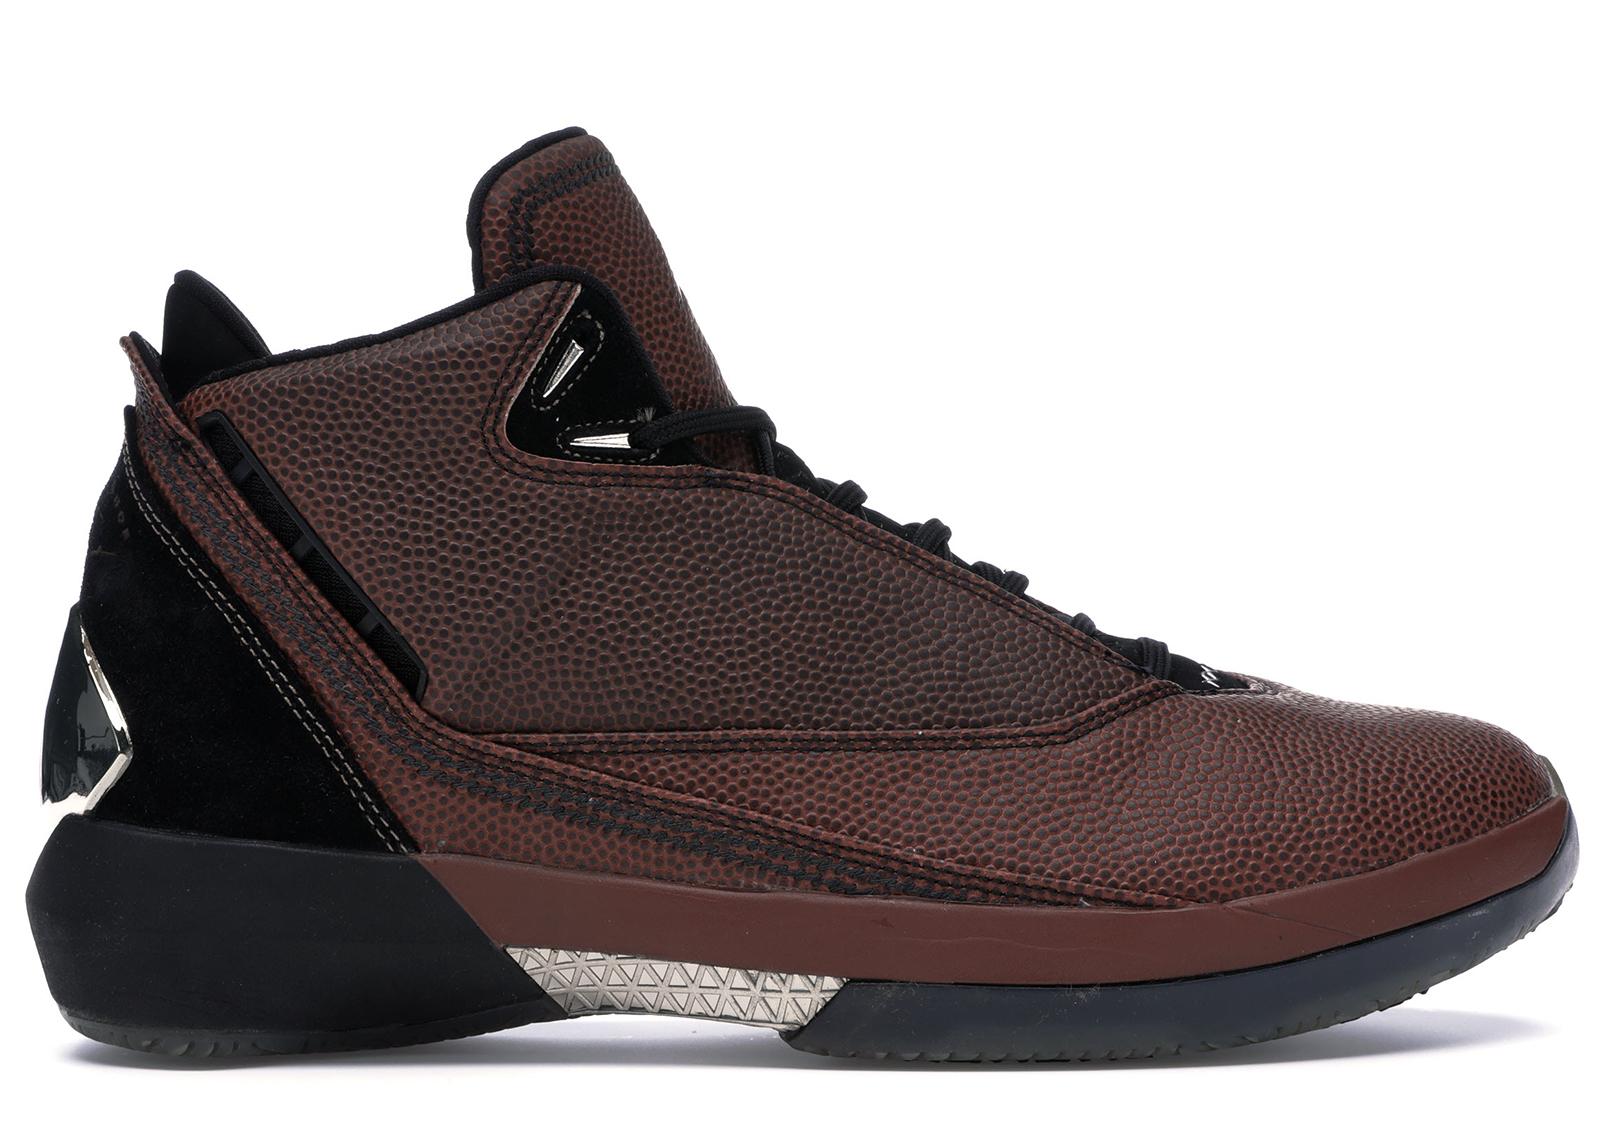 Jordan 22 OG Basketball Leather